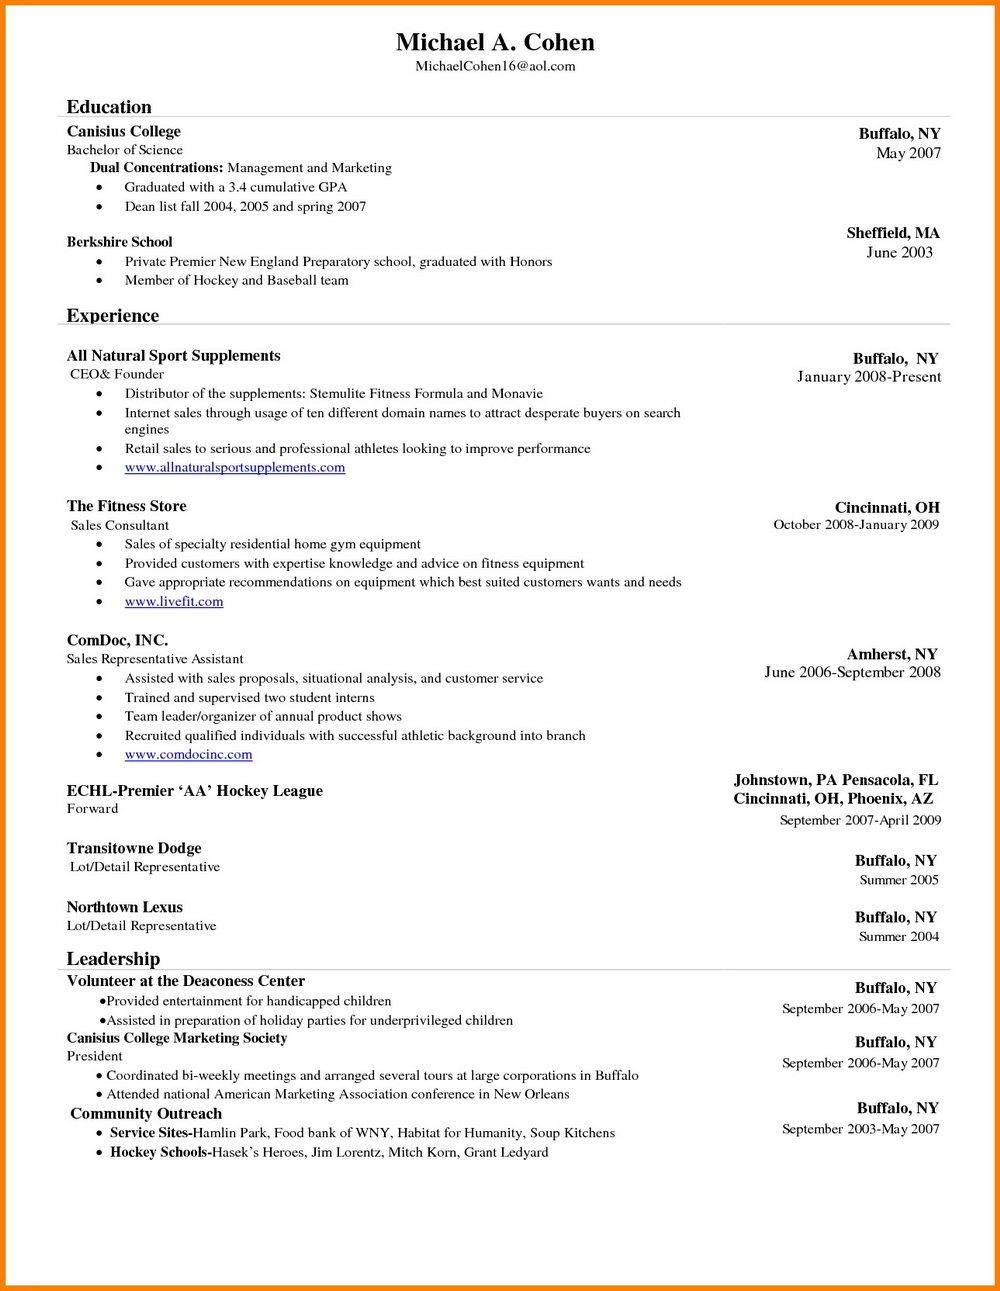 Resume Formatting Microsoft Word